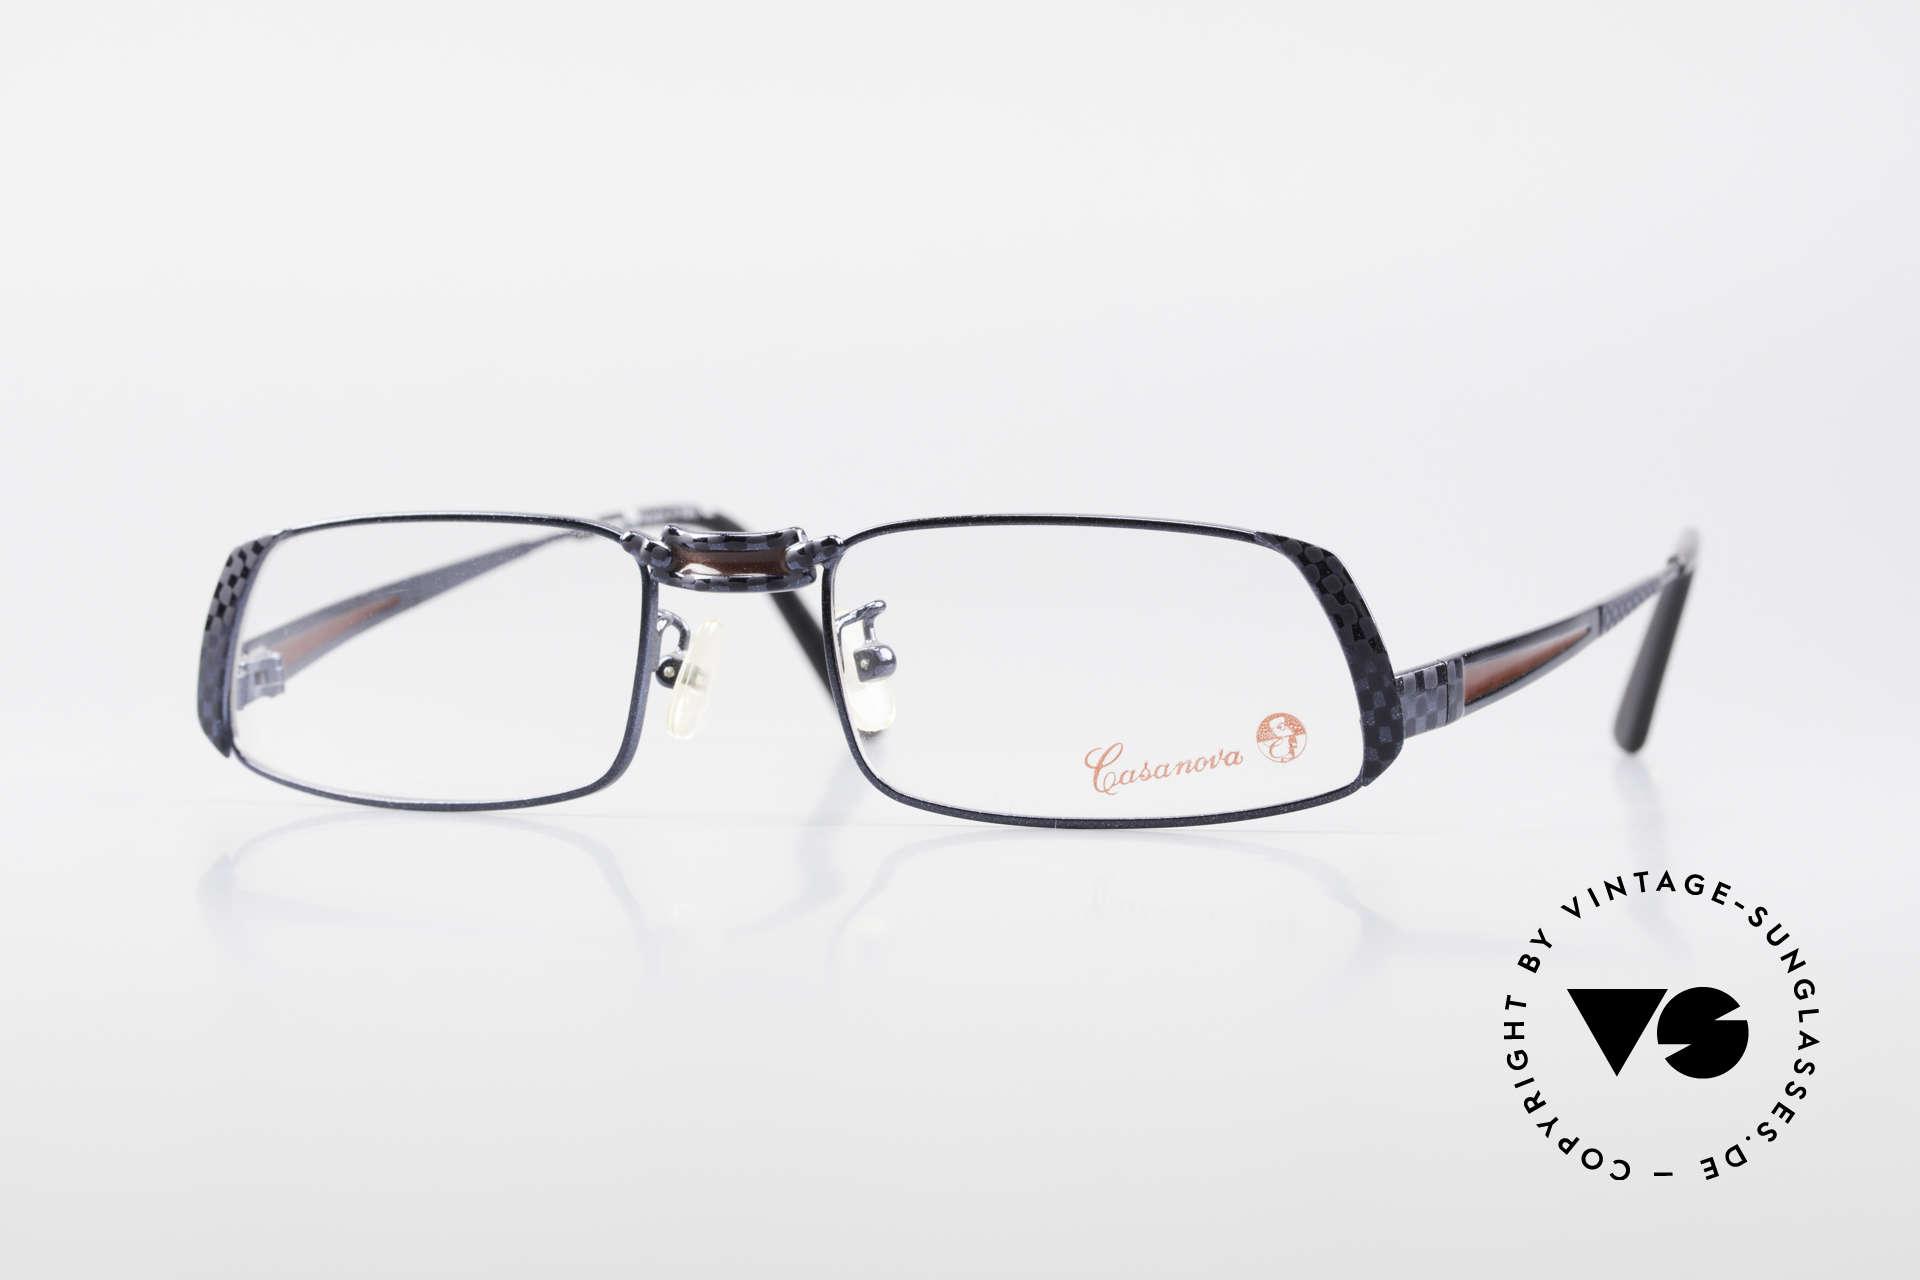 Casanova LC70 Old Vintage Designer Frame, eye-catching Casanova vintage glasses of the 1990's, Made for Men and Women